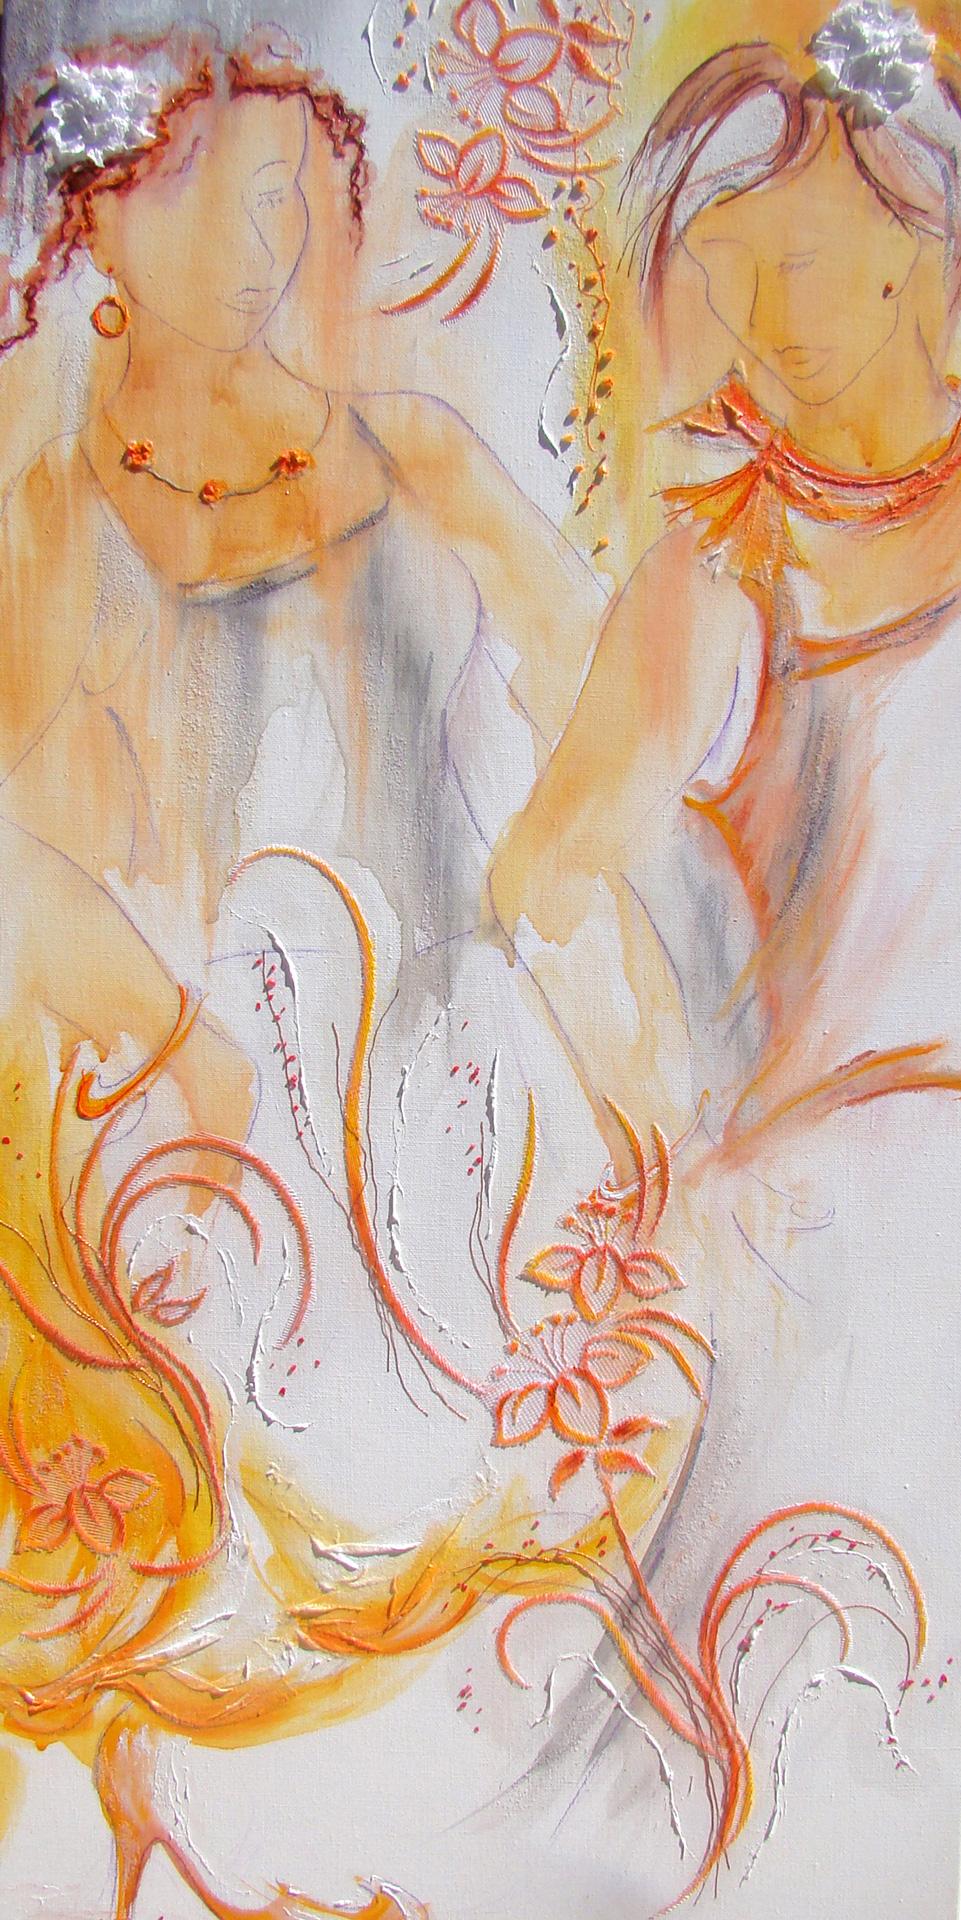 Flamenco, variation en orange